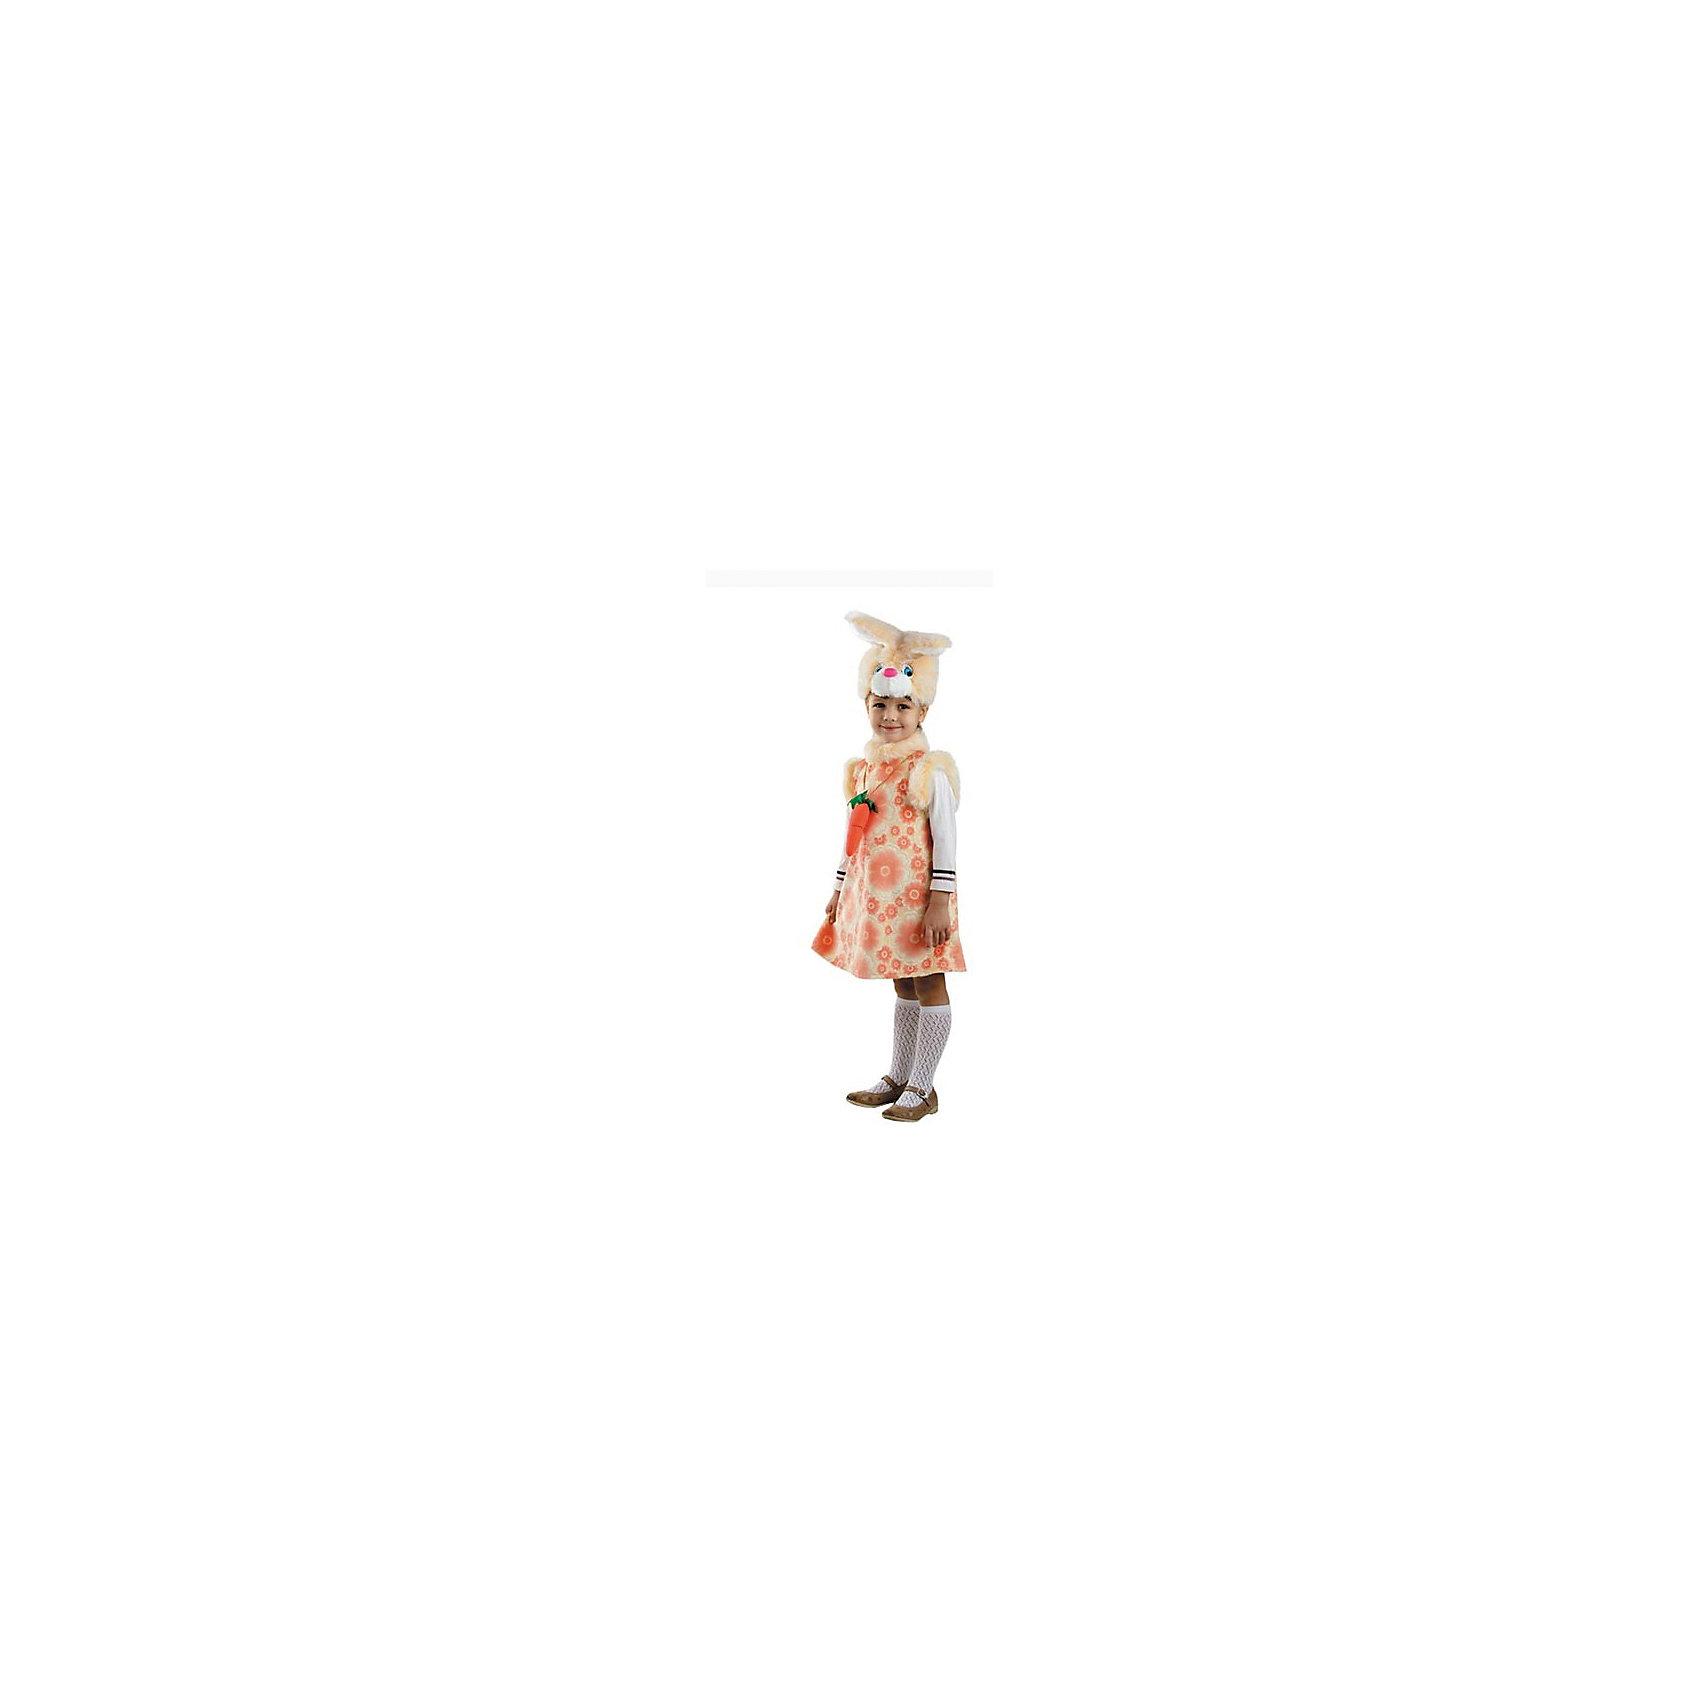 Батик Карнавальный костюм Зайка Липси, Батик incity карнавальный костюм единорог